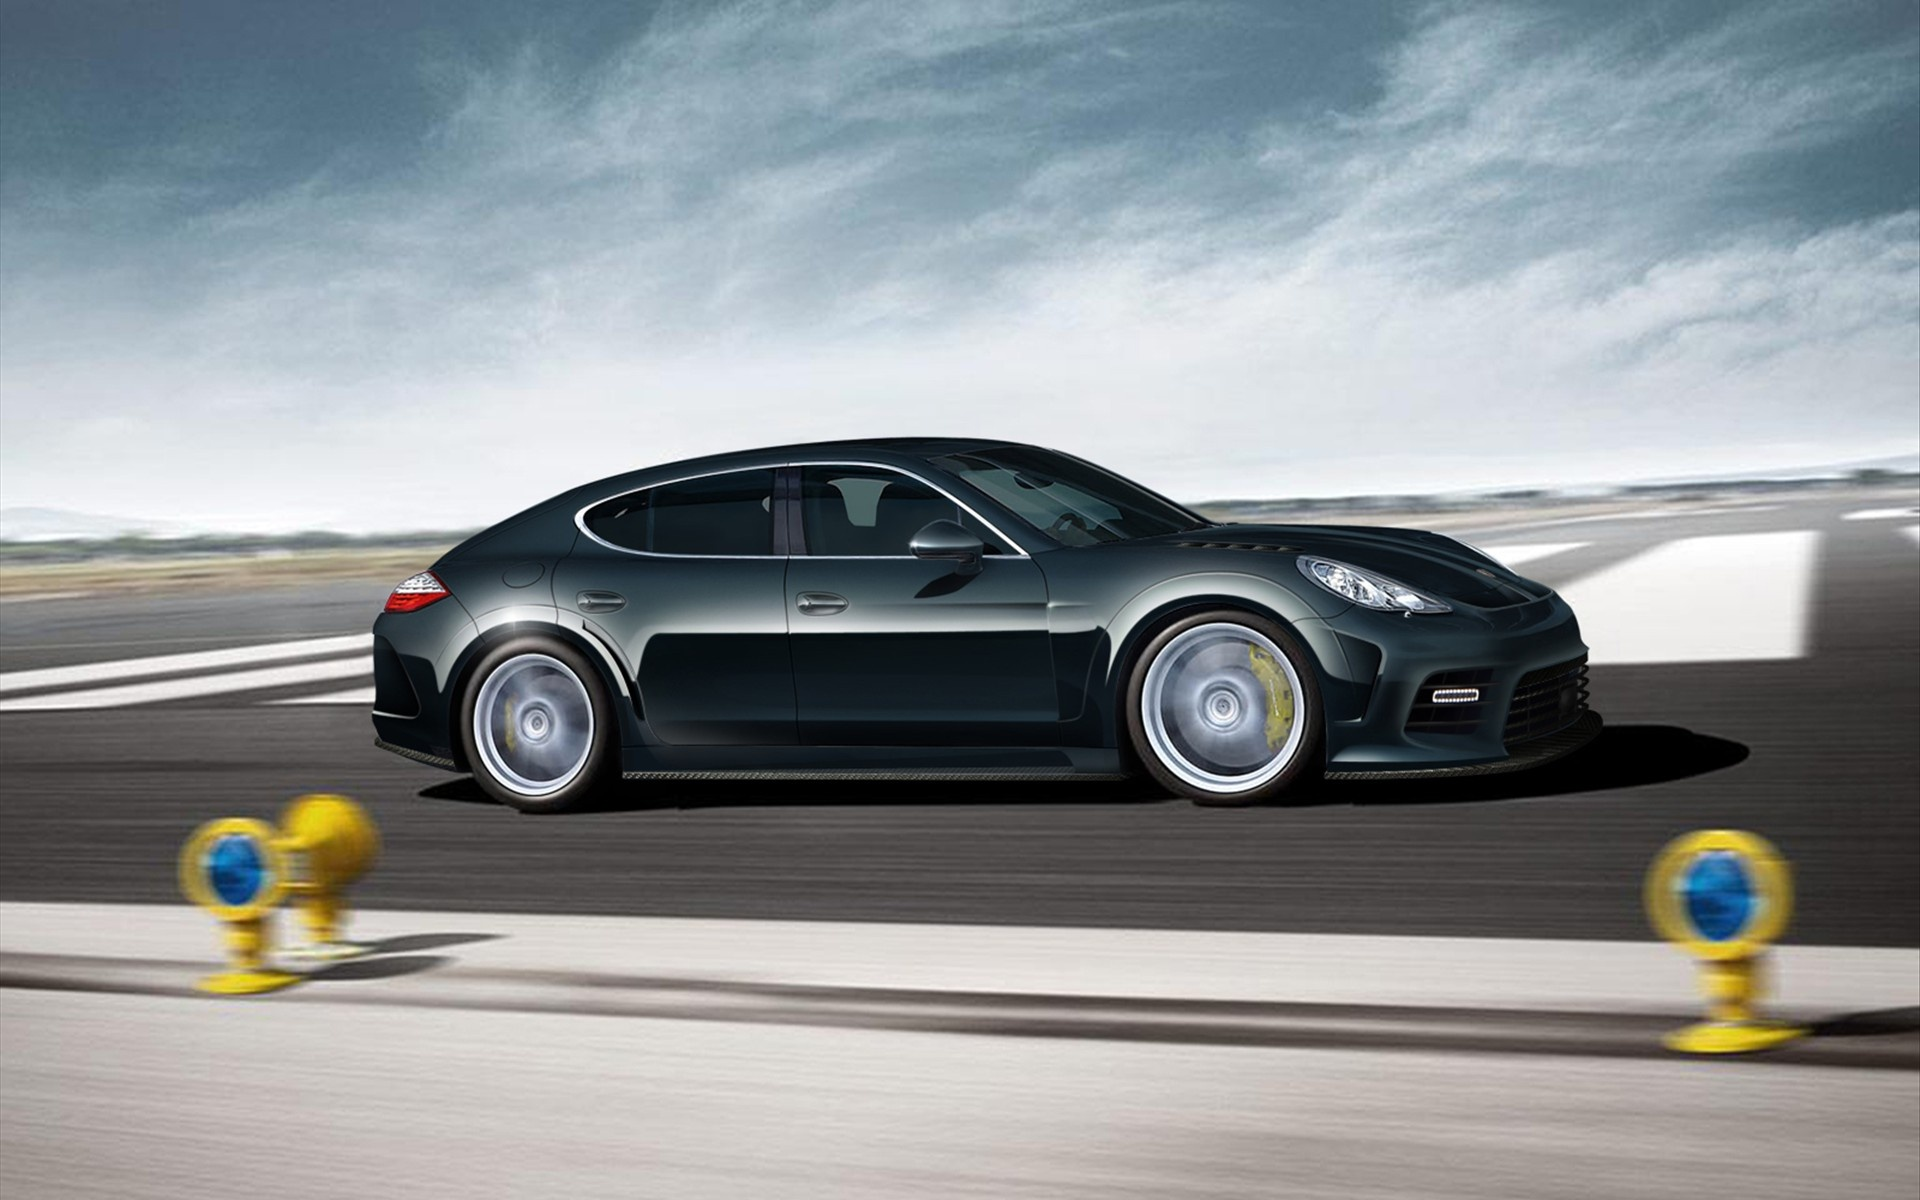 download Speedy Mansory Porsche Hd Wallpaper